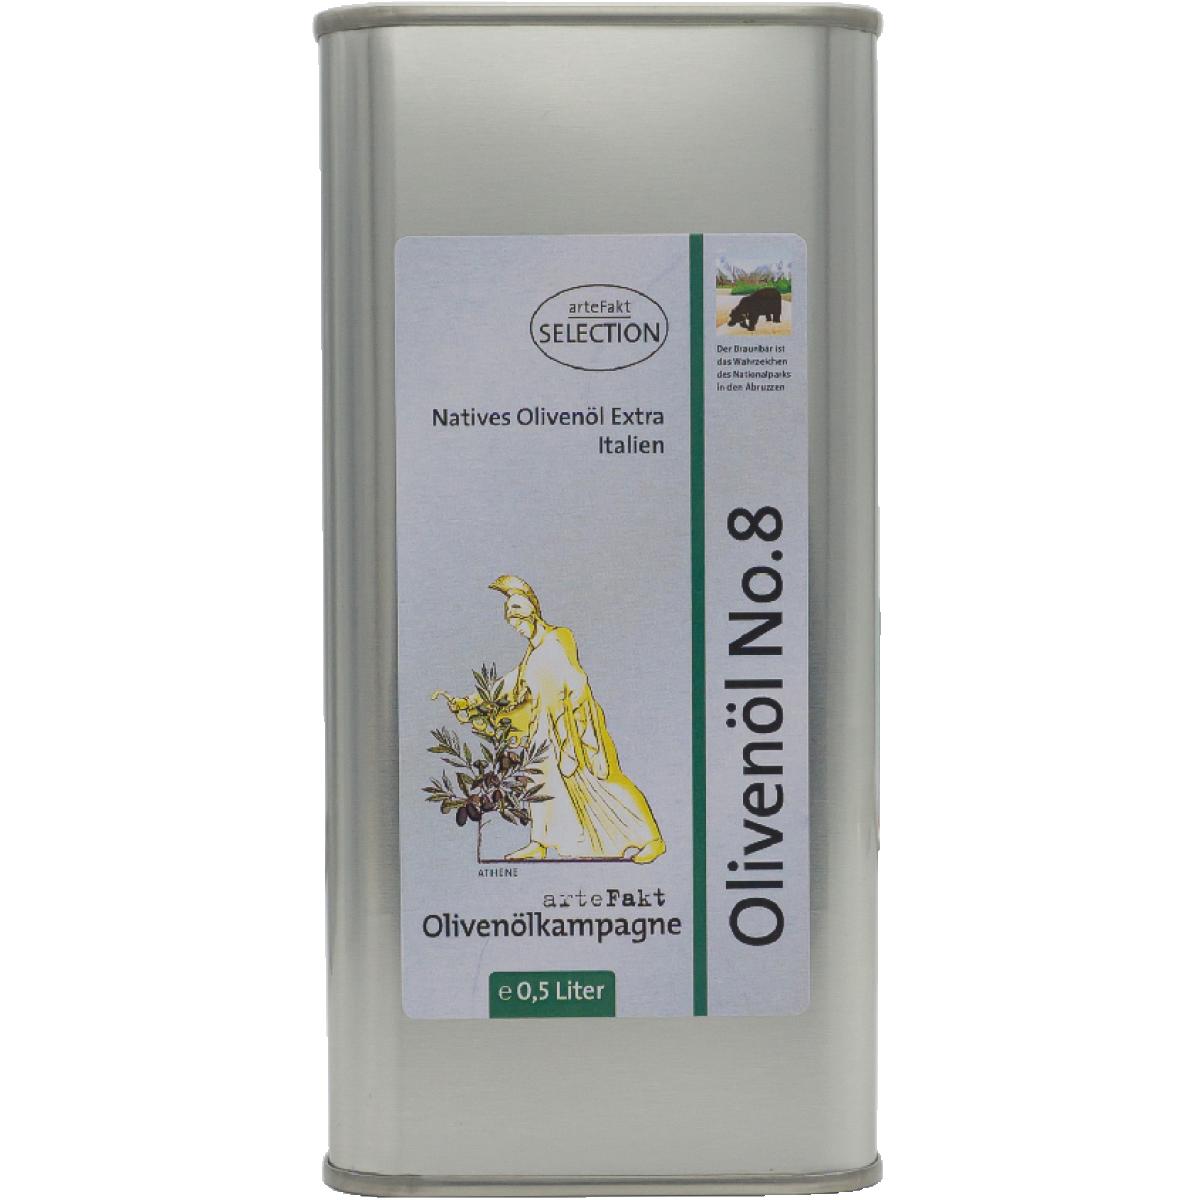 Olivenöl No 8; Abruzzen